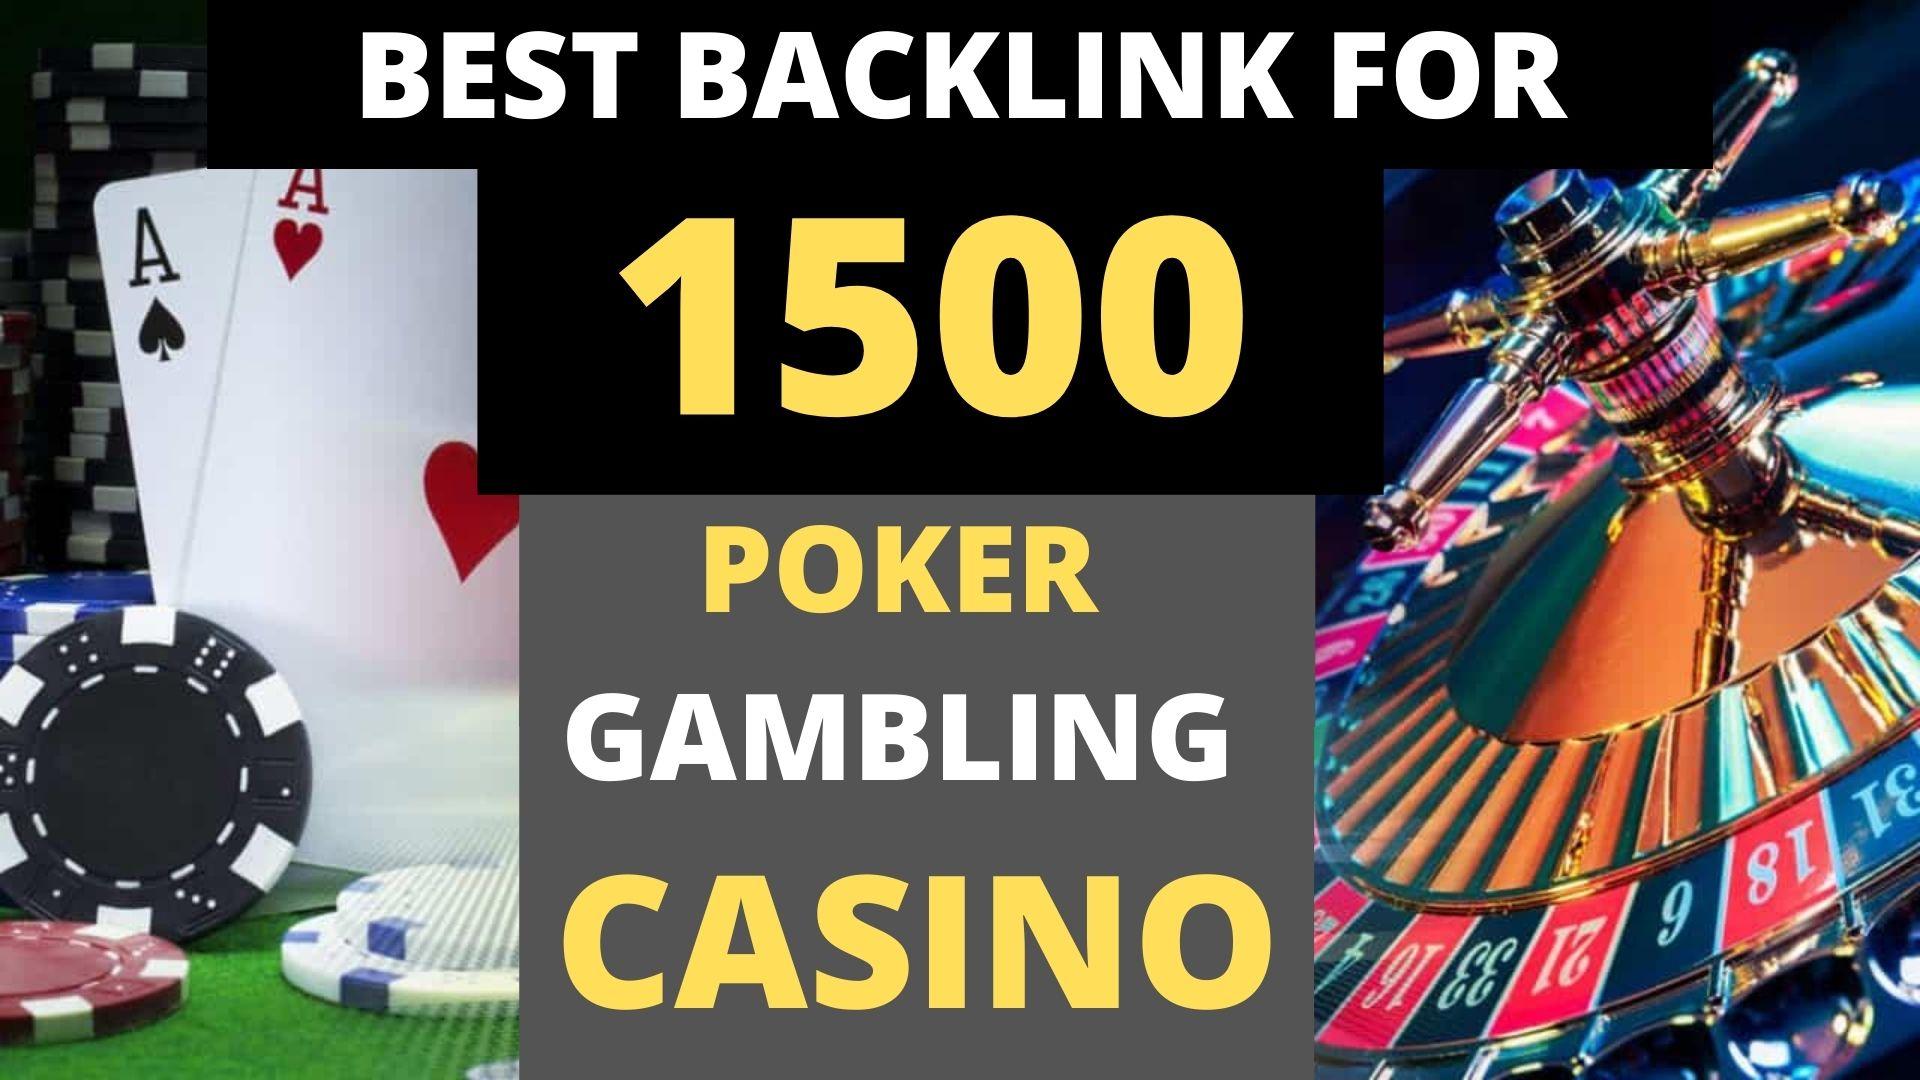 I Will Do 1500+PBN Indonesian/Thailand Keywords Casino/Gambling/Poker PBN Backlinks